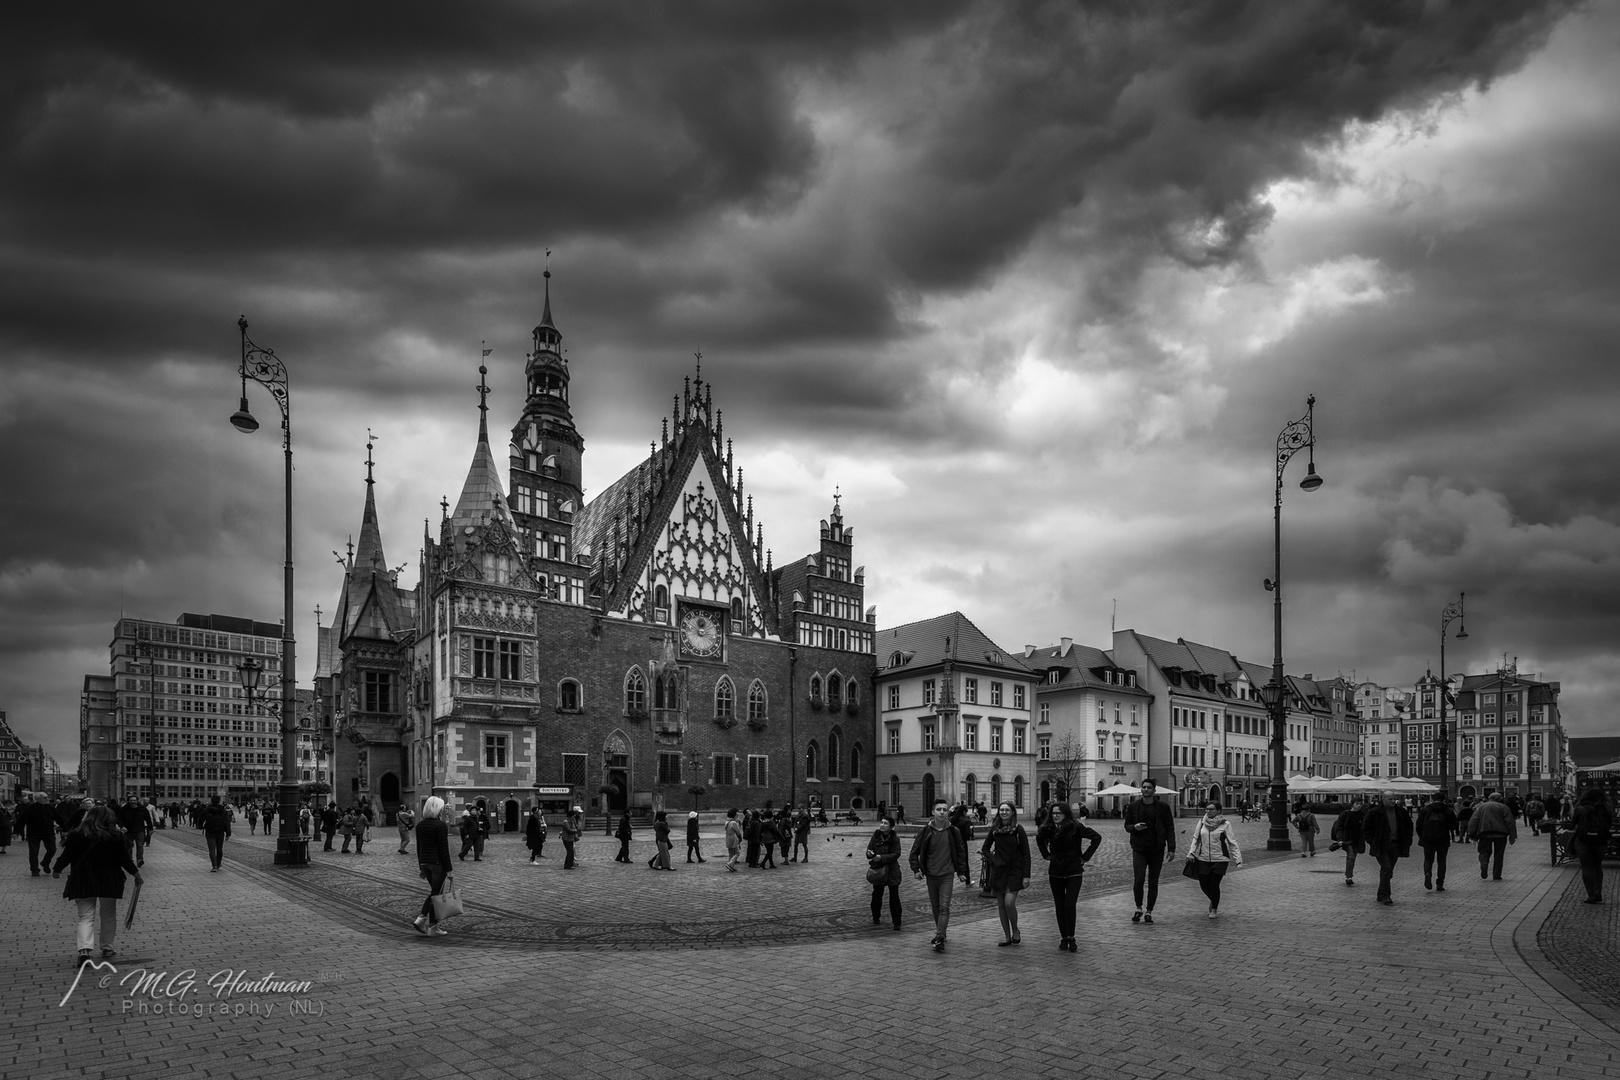 Rynek, Market Square - Wroc?aw (PL)